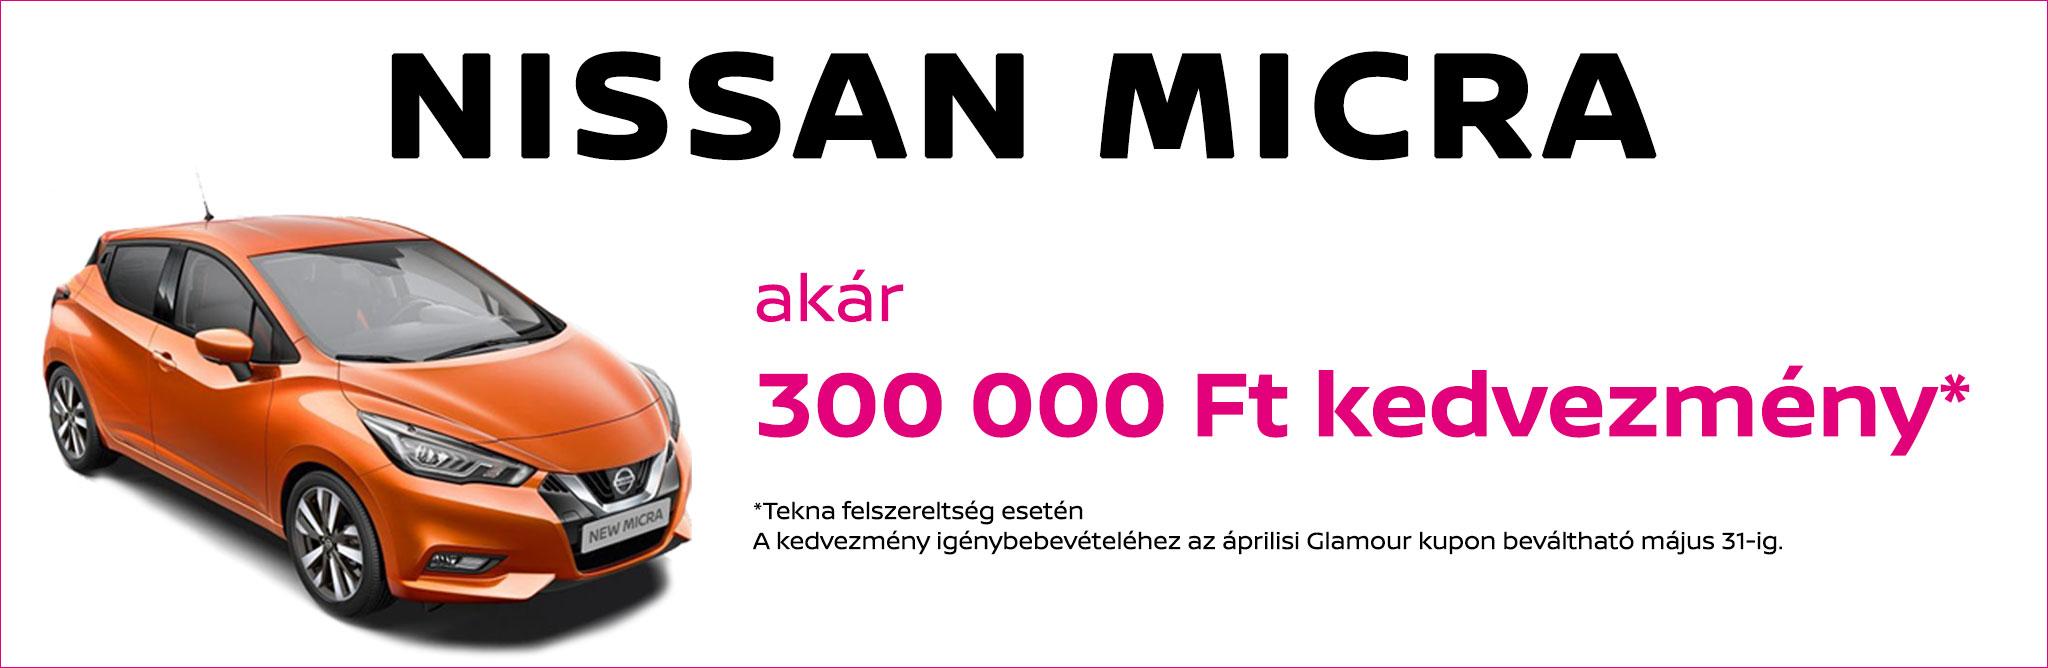 Nissan Micra Glamour kupon